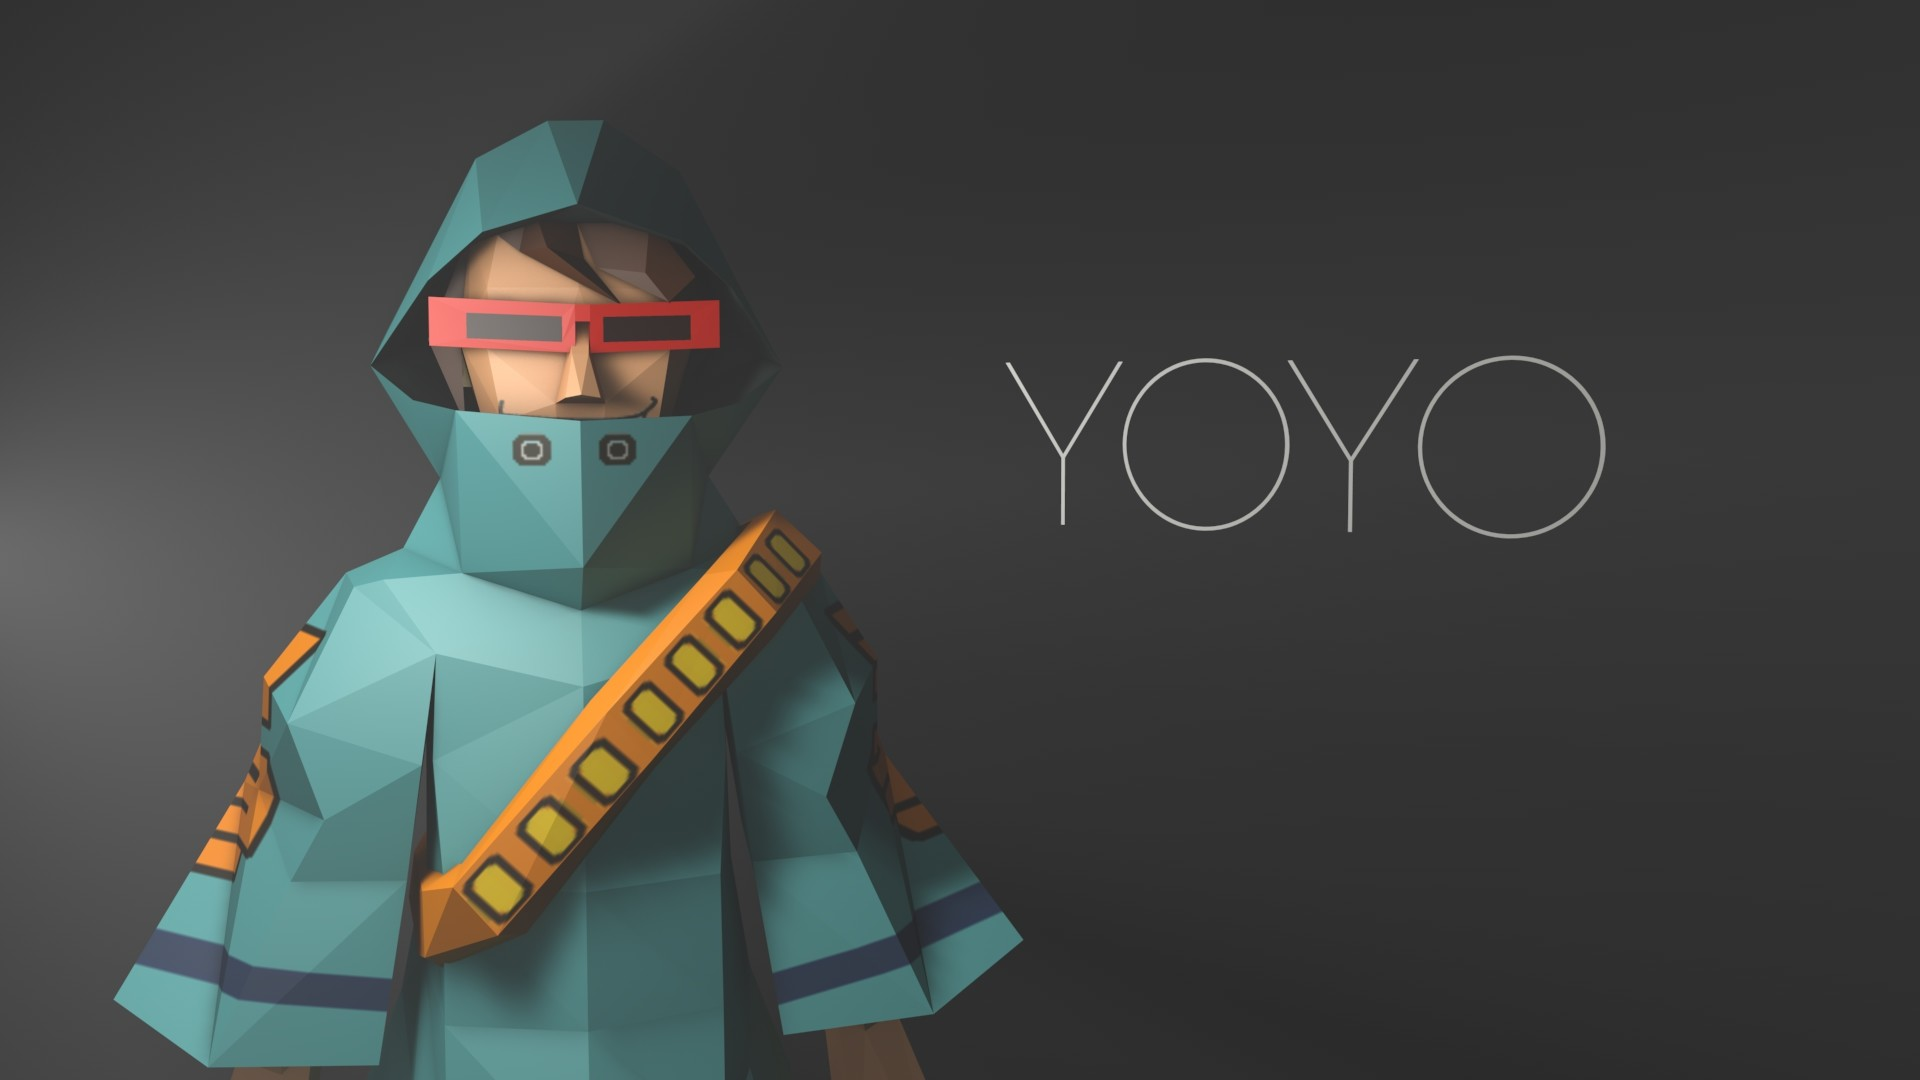 YoYo Low Polygon Render by JsrfYo YoYo Low Polygon Render by JsrfYo